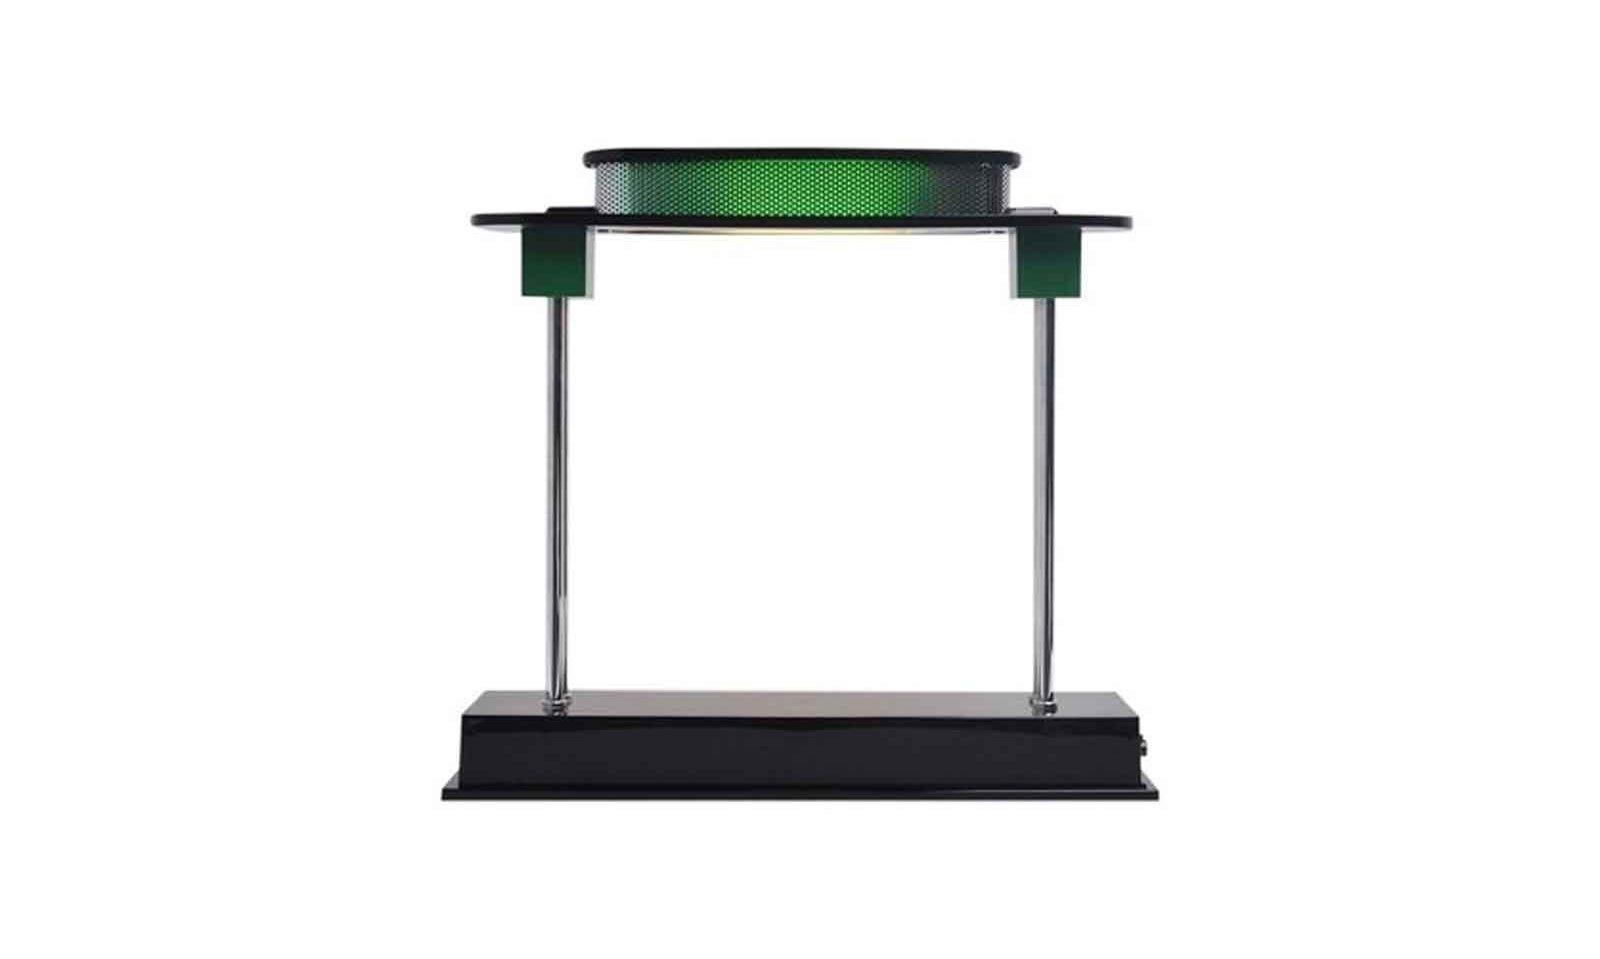 Artemide pausania lampada led di design verde ed alluminio - Lampade da tavolo a led ...